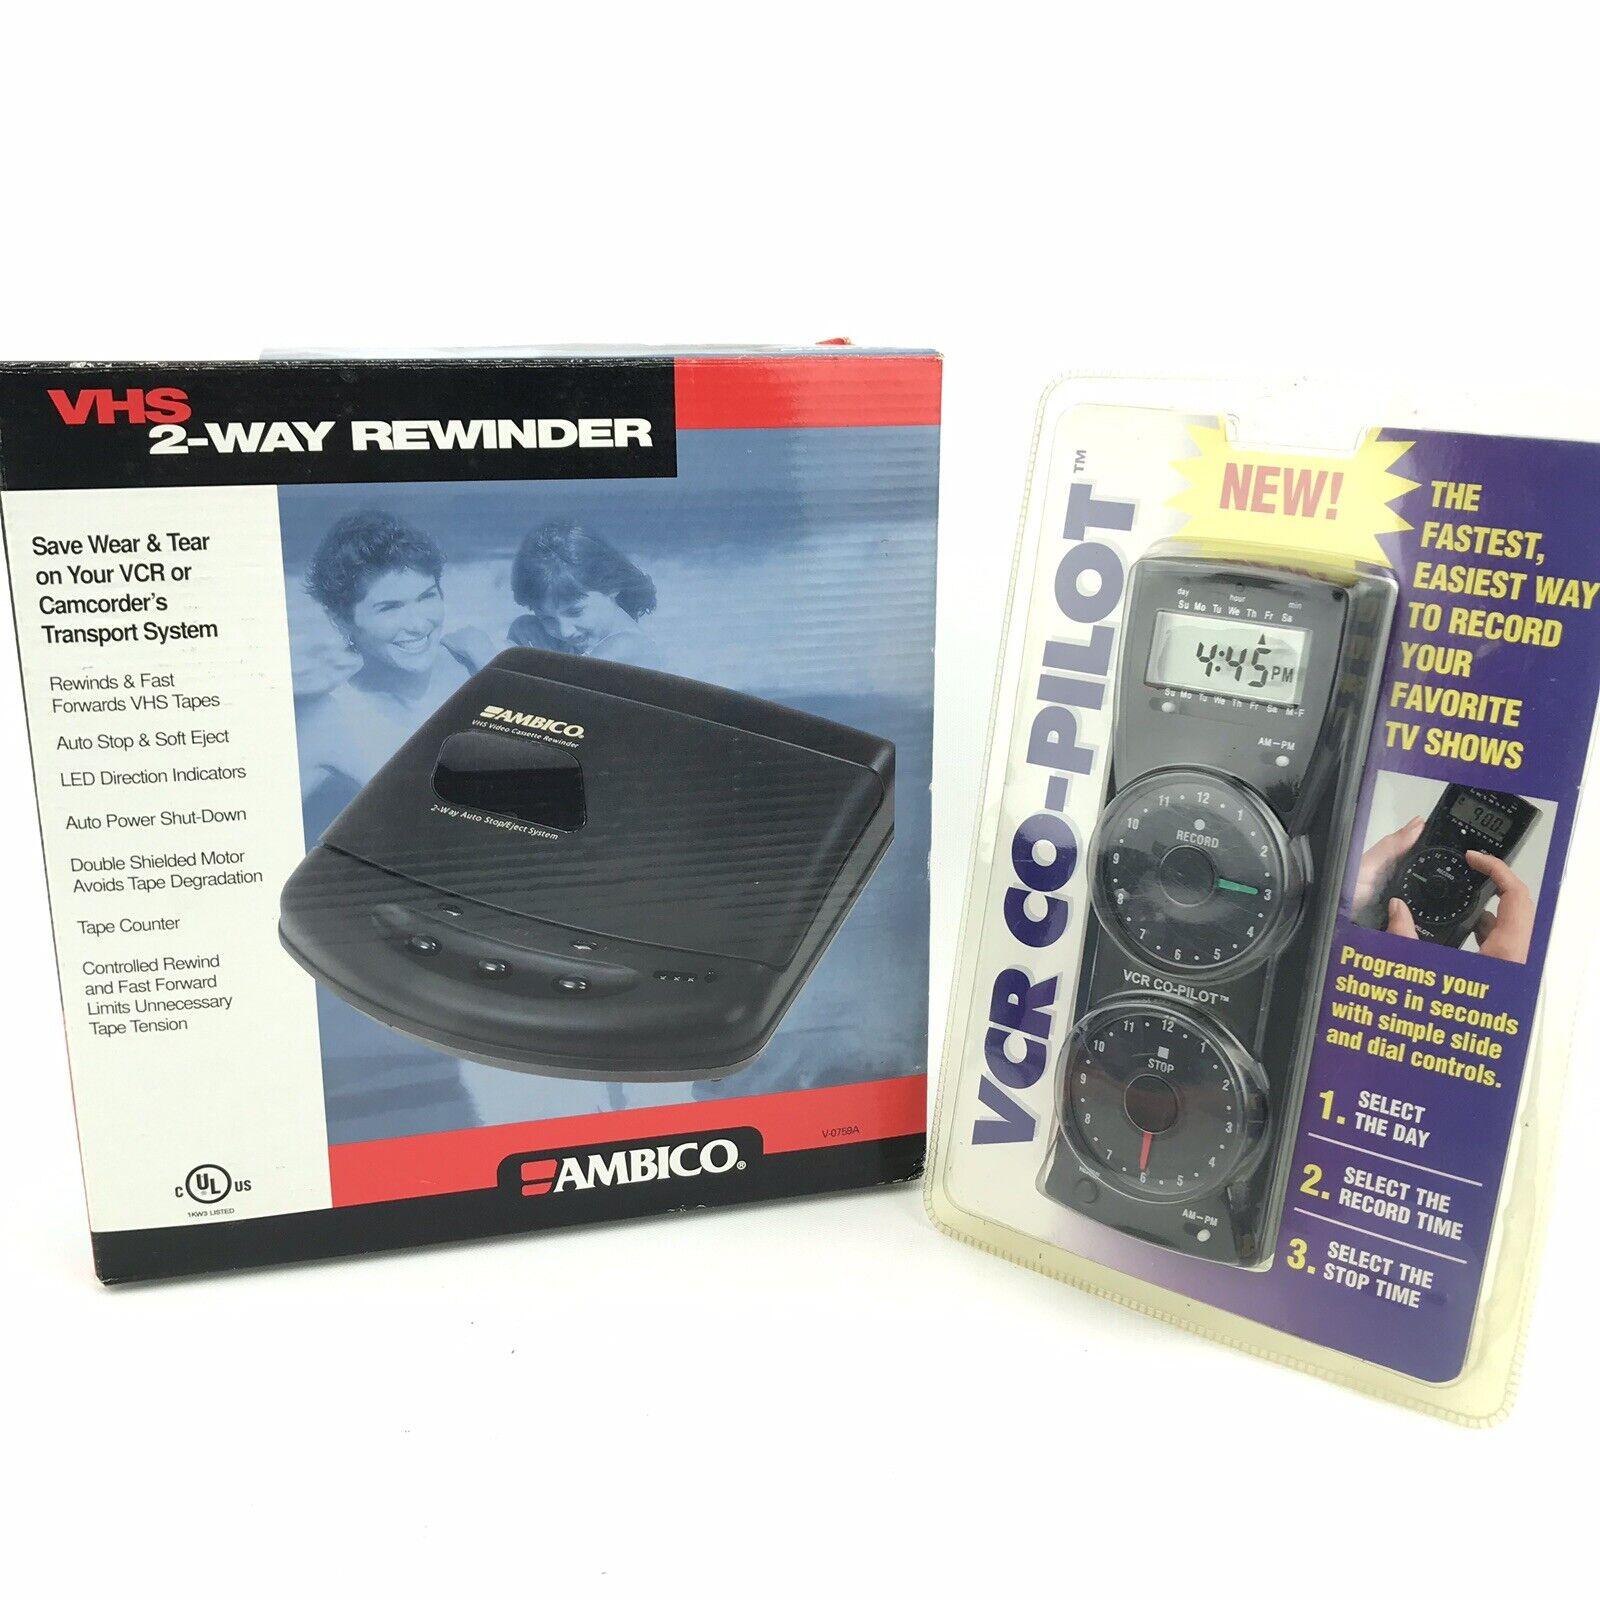 Ambico 2 Way Vhs Video Cassette Tape Rewinder Black Casing w// Auto Eject